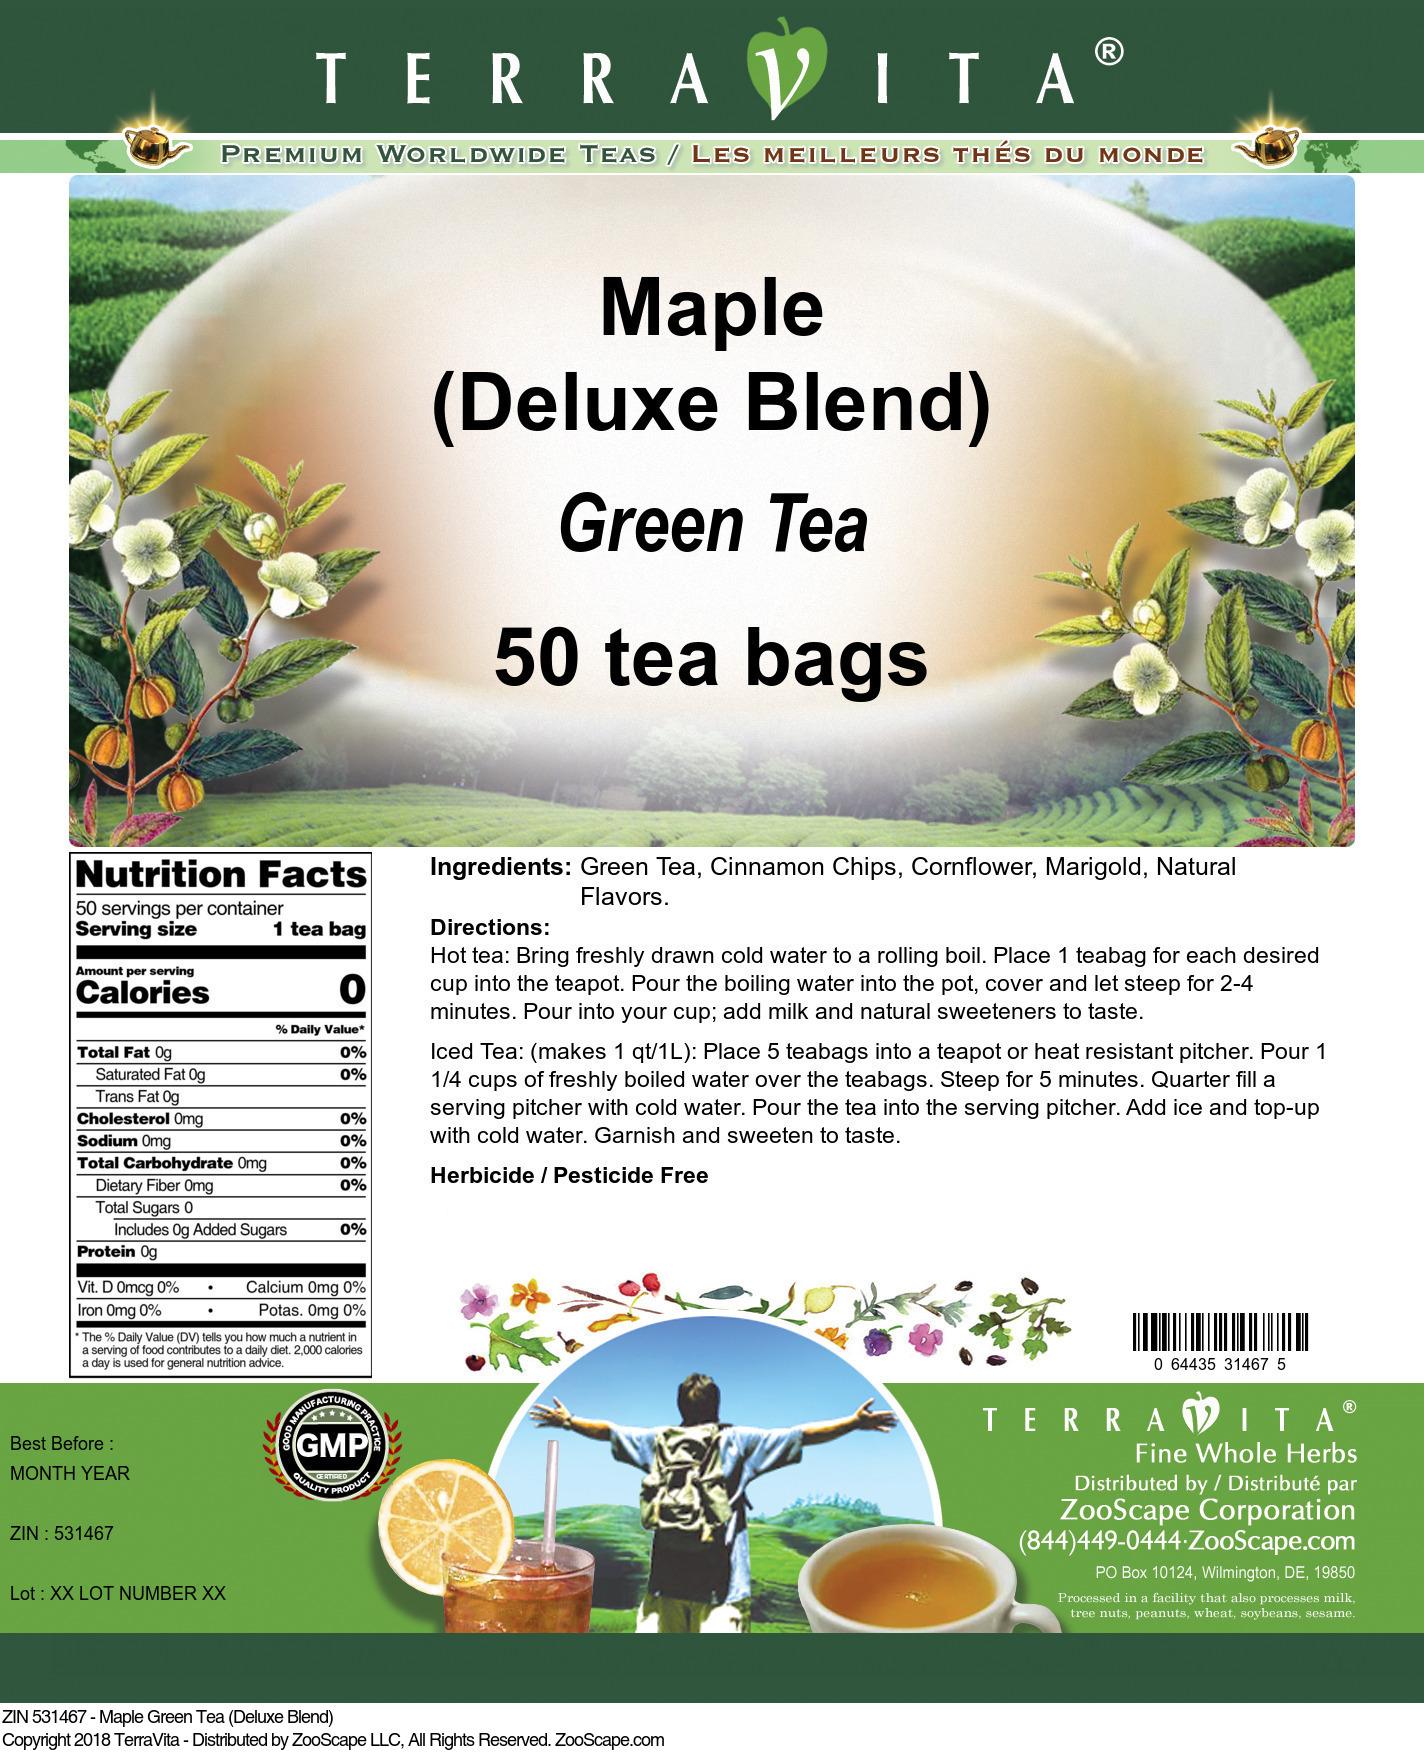 Maple Green Tea (Deluxe Blend)